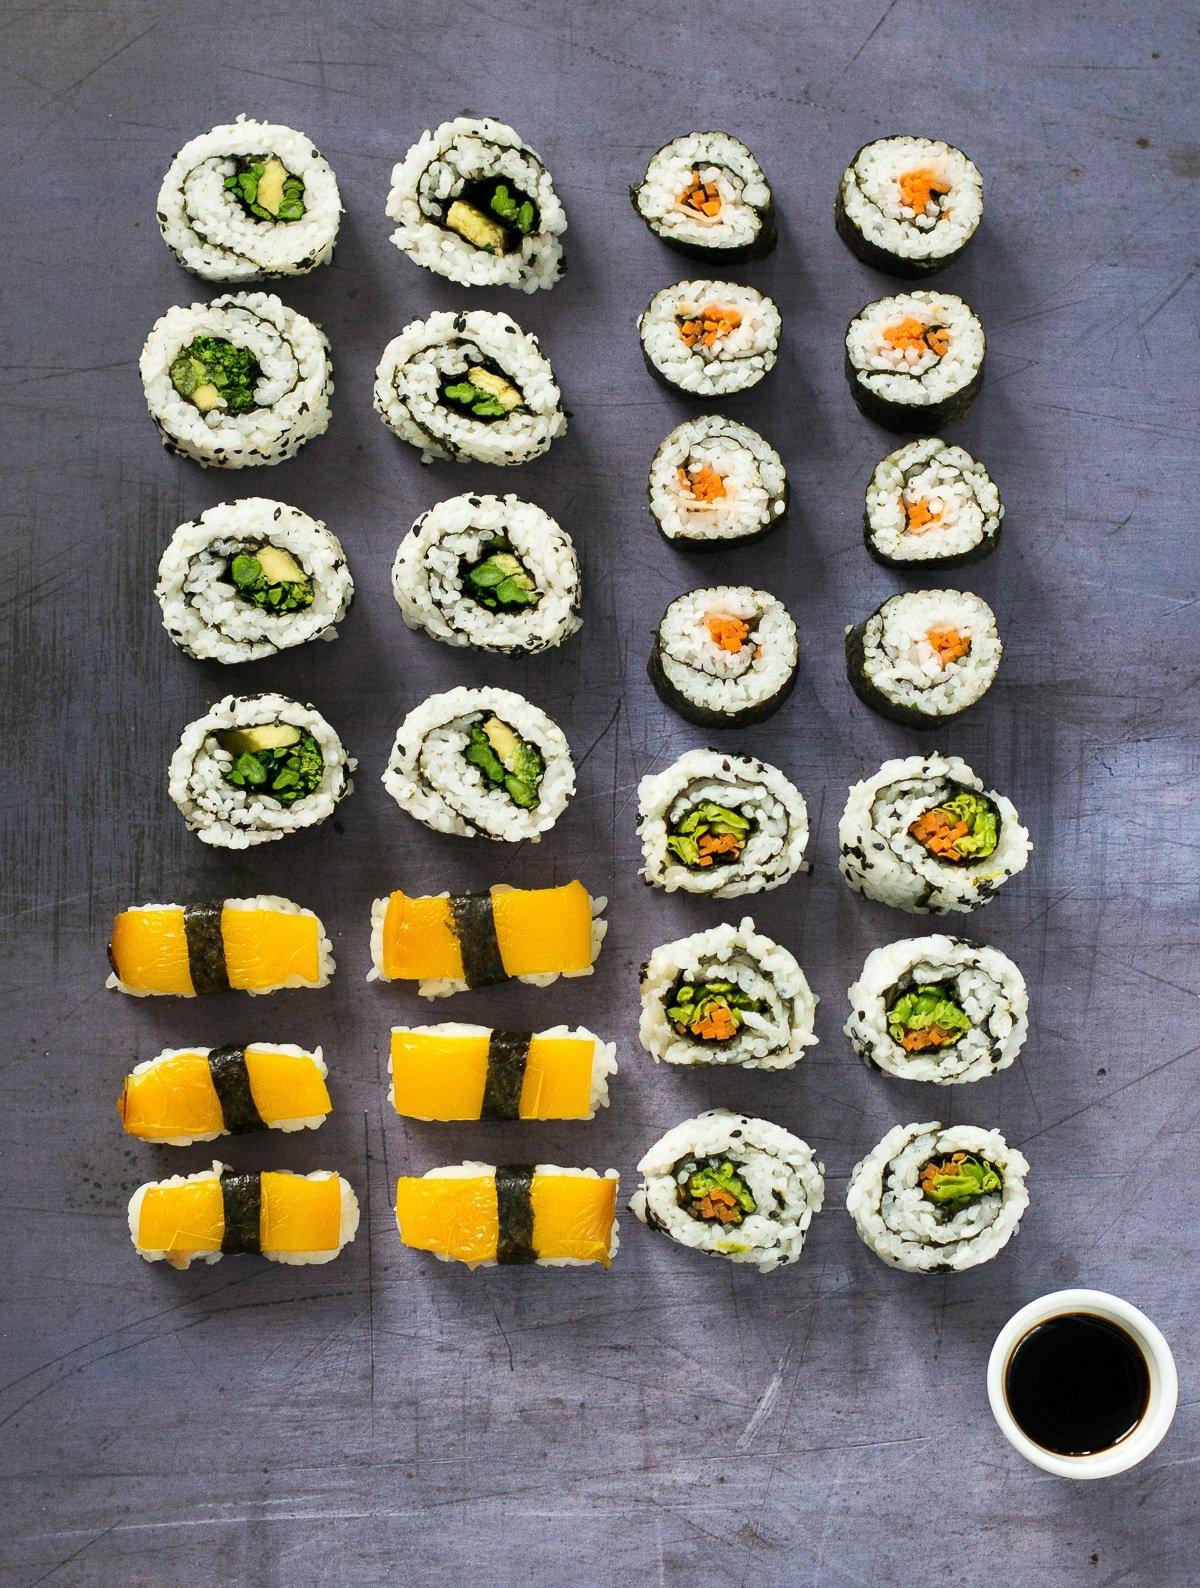 Easy Vegan Sushi The Veg Space Vegan Recipes